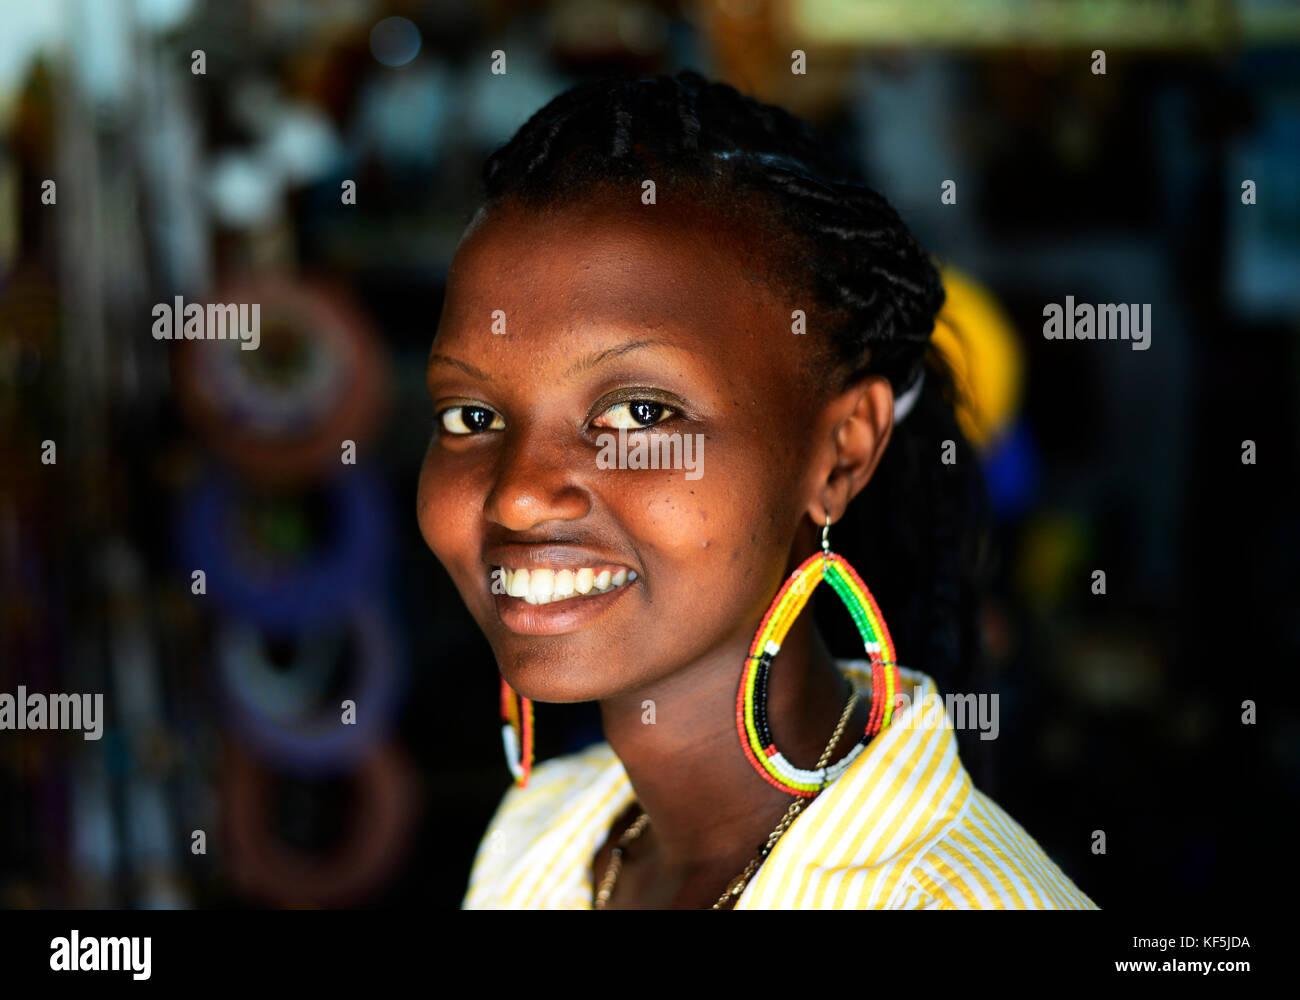 Portrait of a smiling Tanzanian woman. - Stock Image